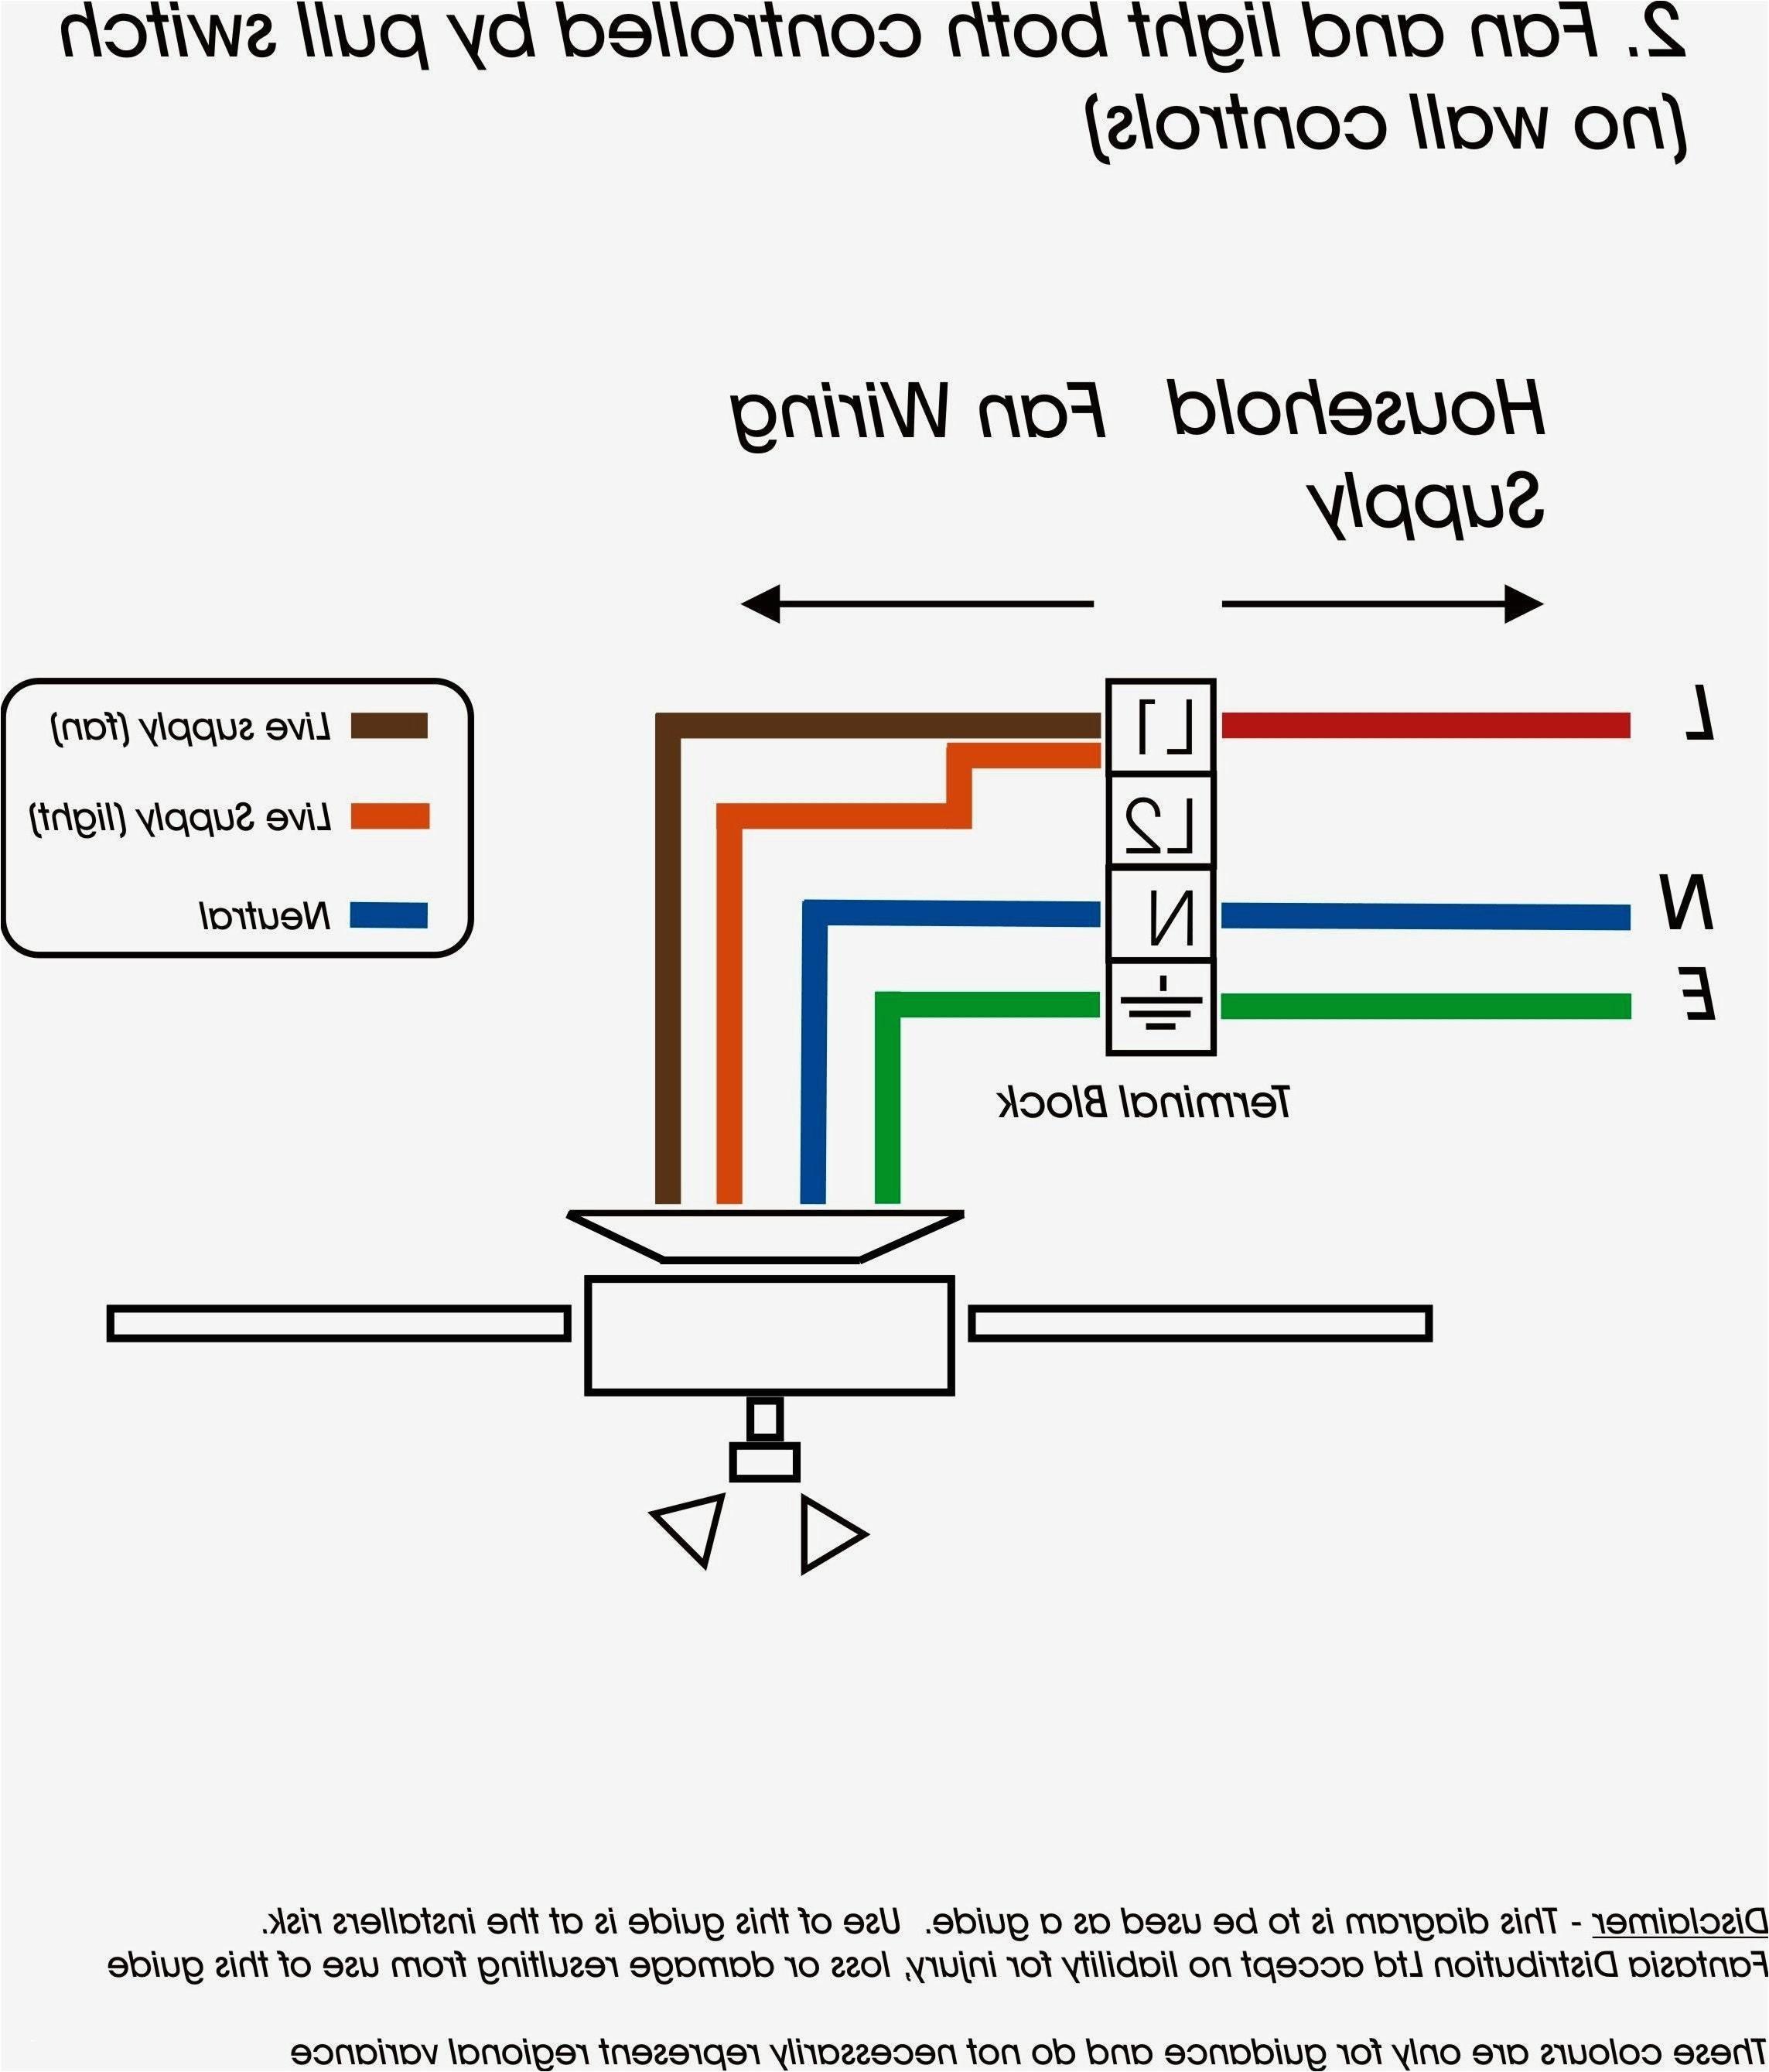 3 wire cord diagram wiring diagram pos 3 wire cord diagram 3 wire cord diagram